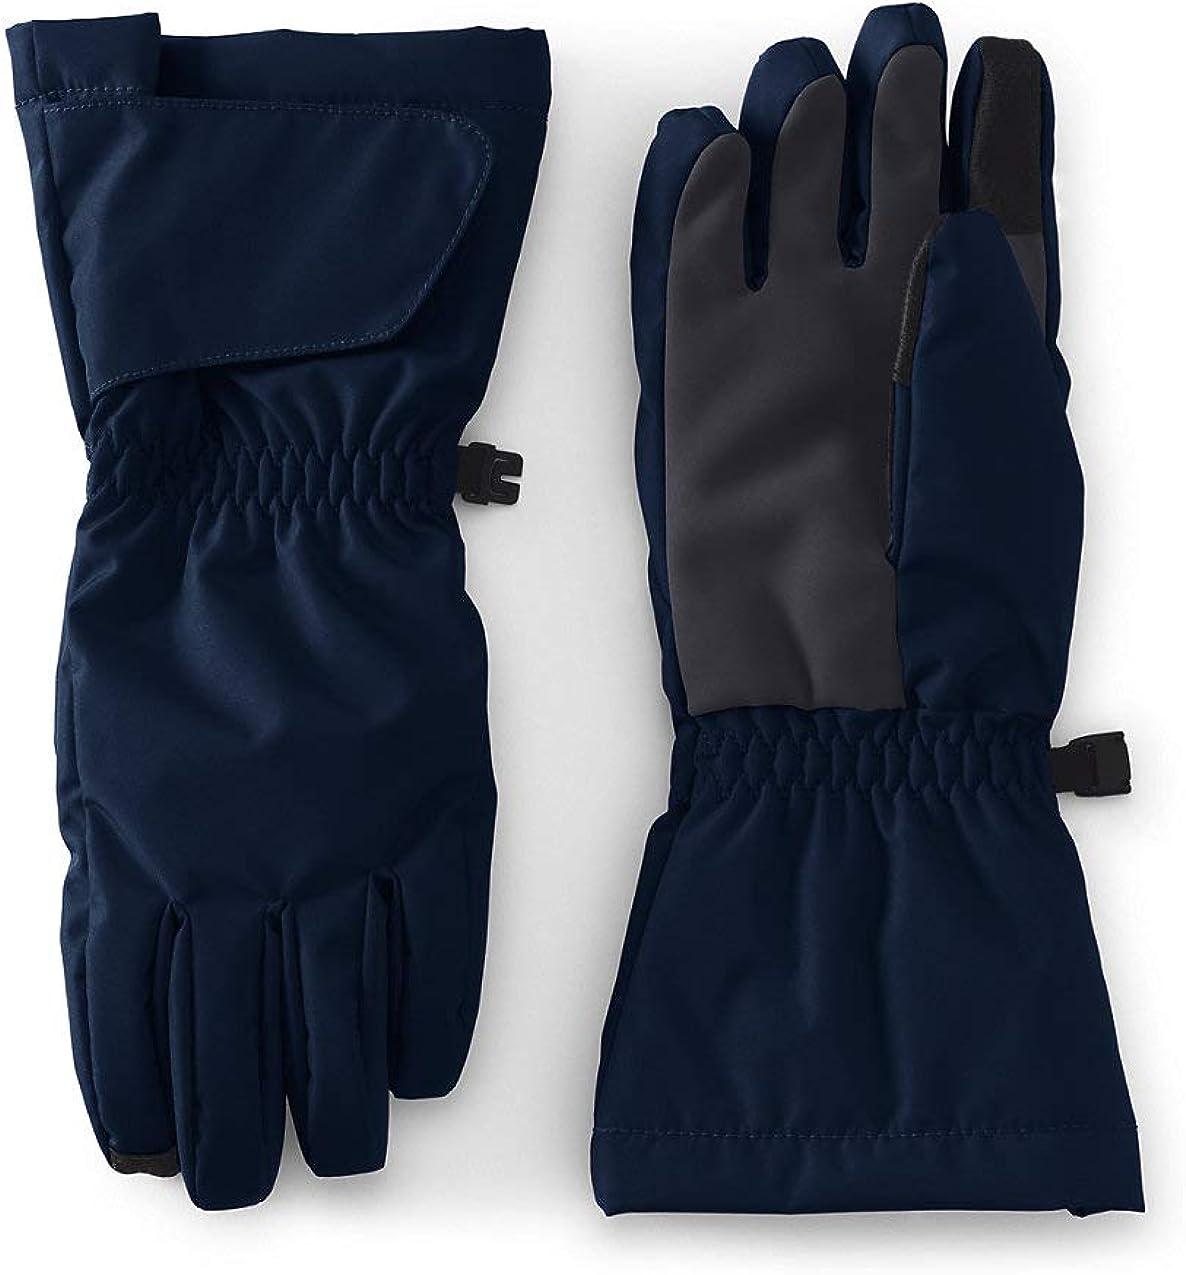 Lands' End Kids Expedition Glove